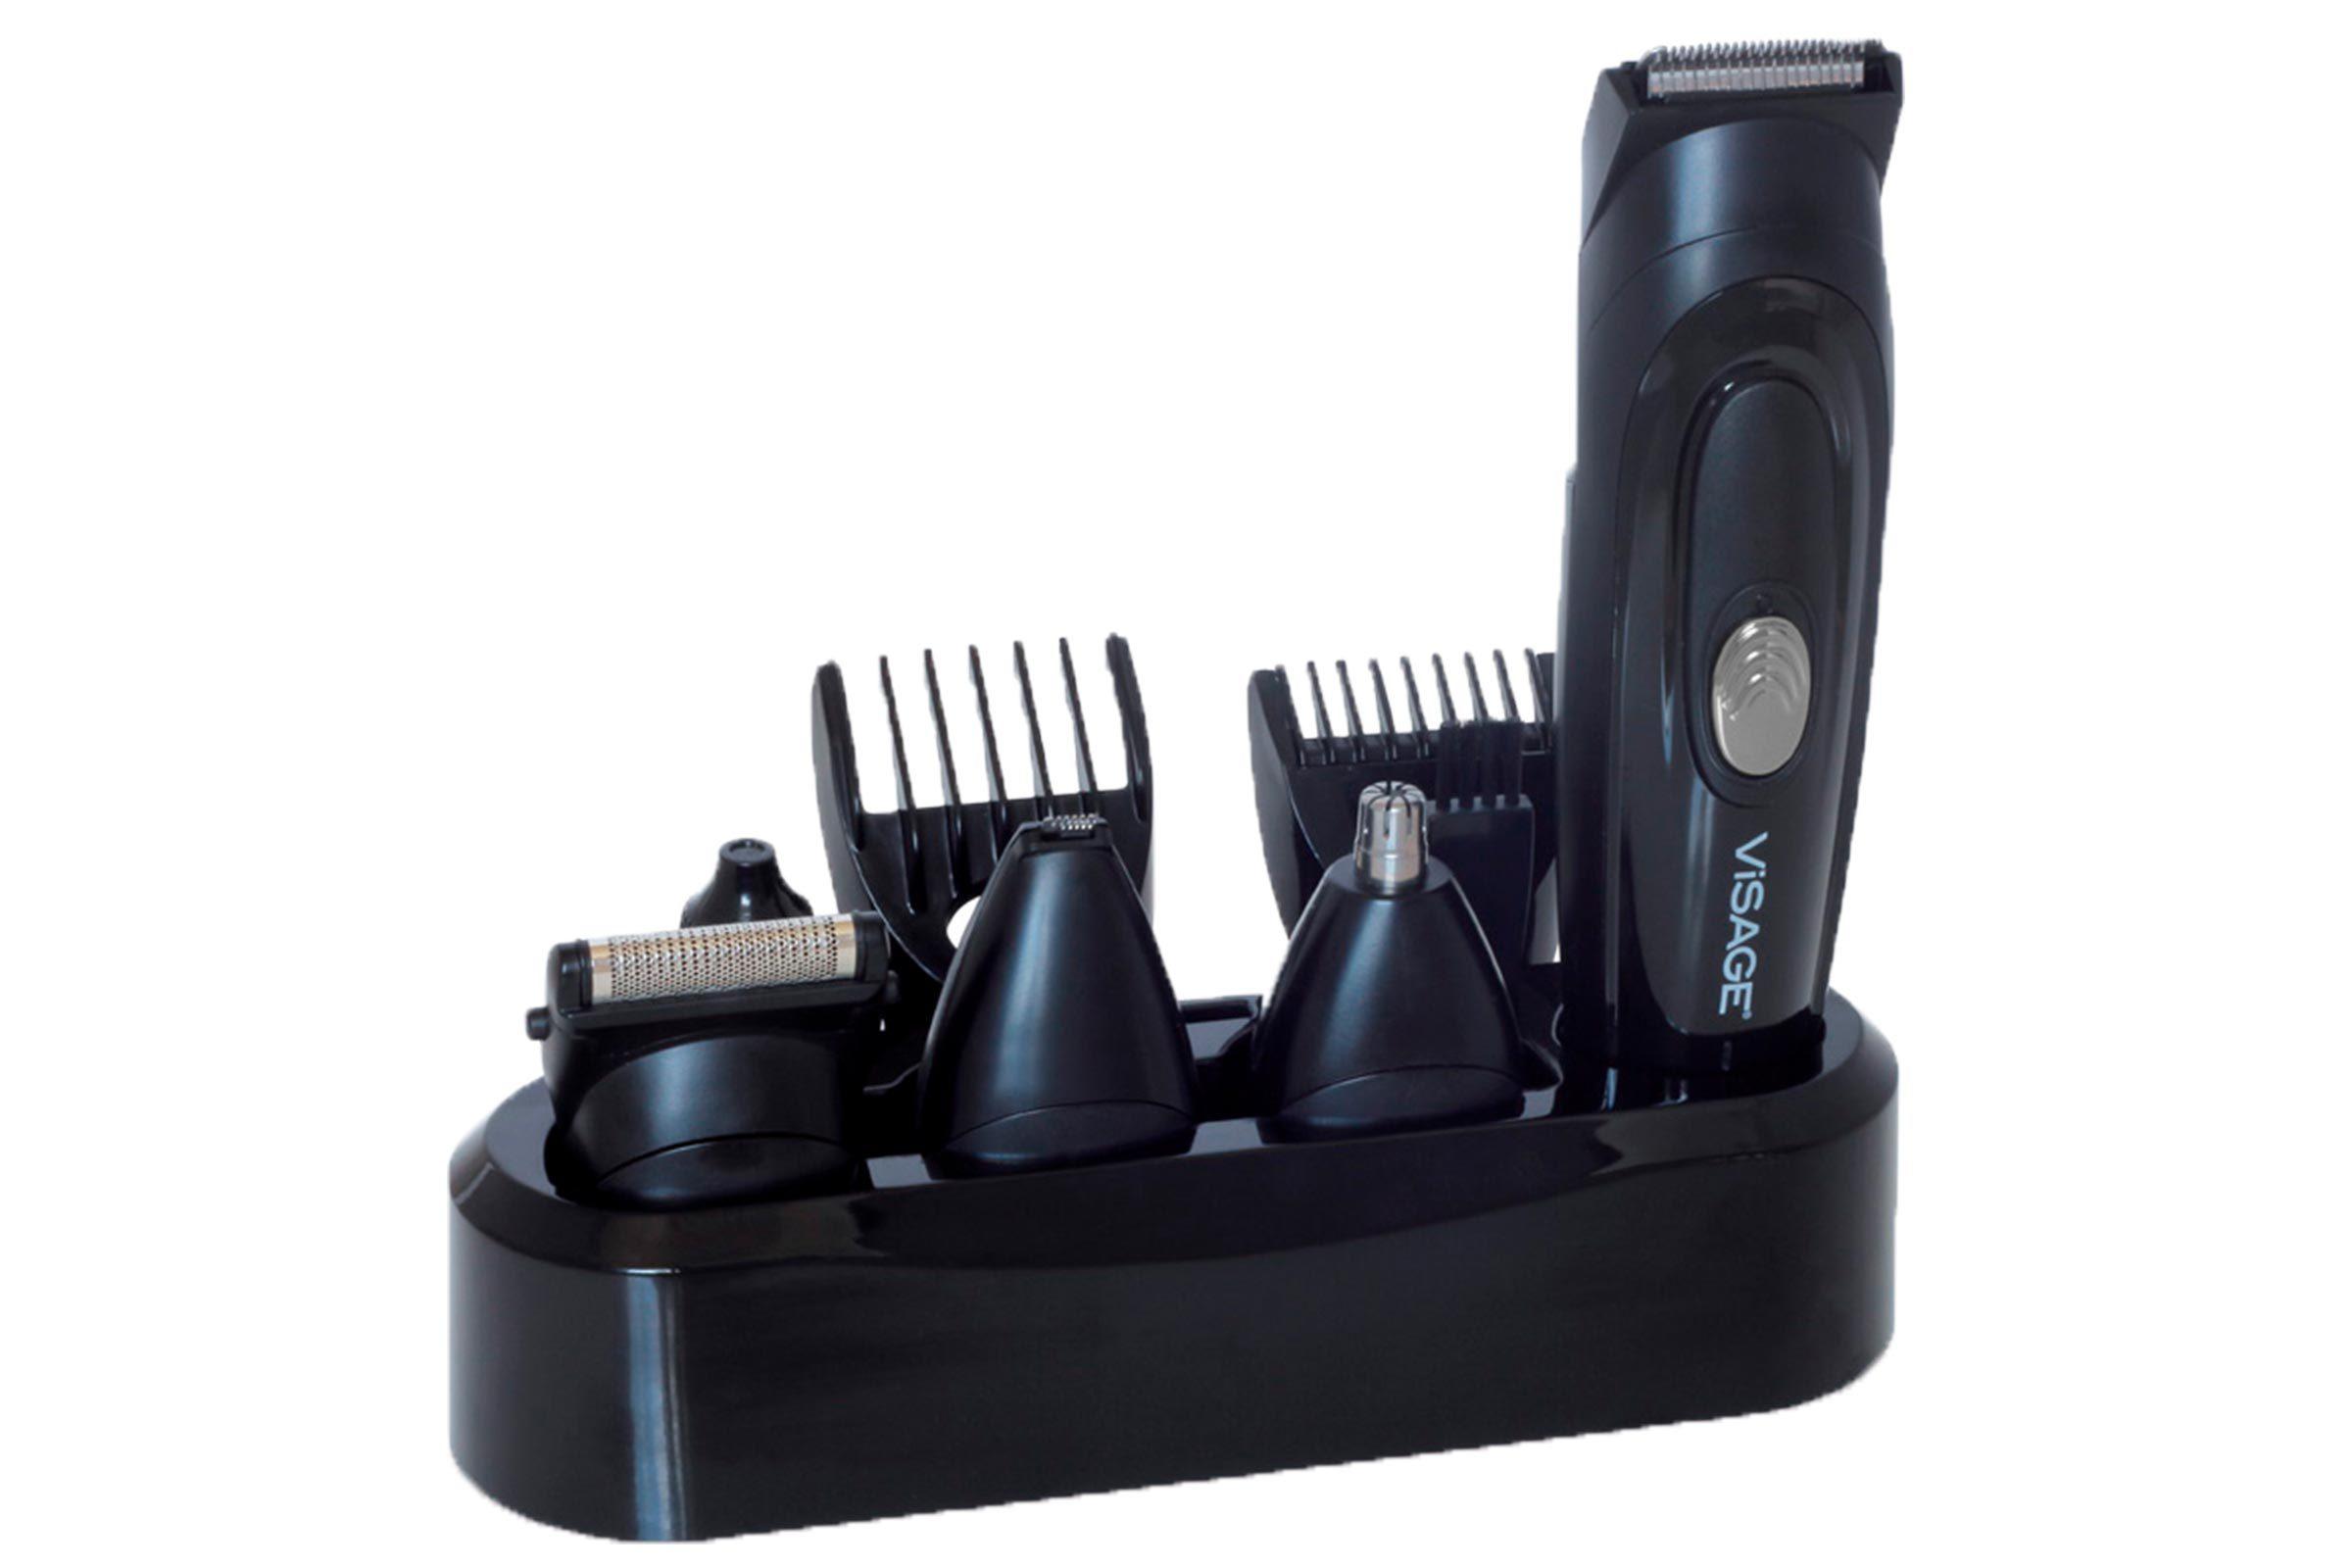 Visage All in One Grooming Kit